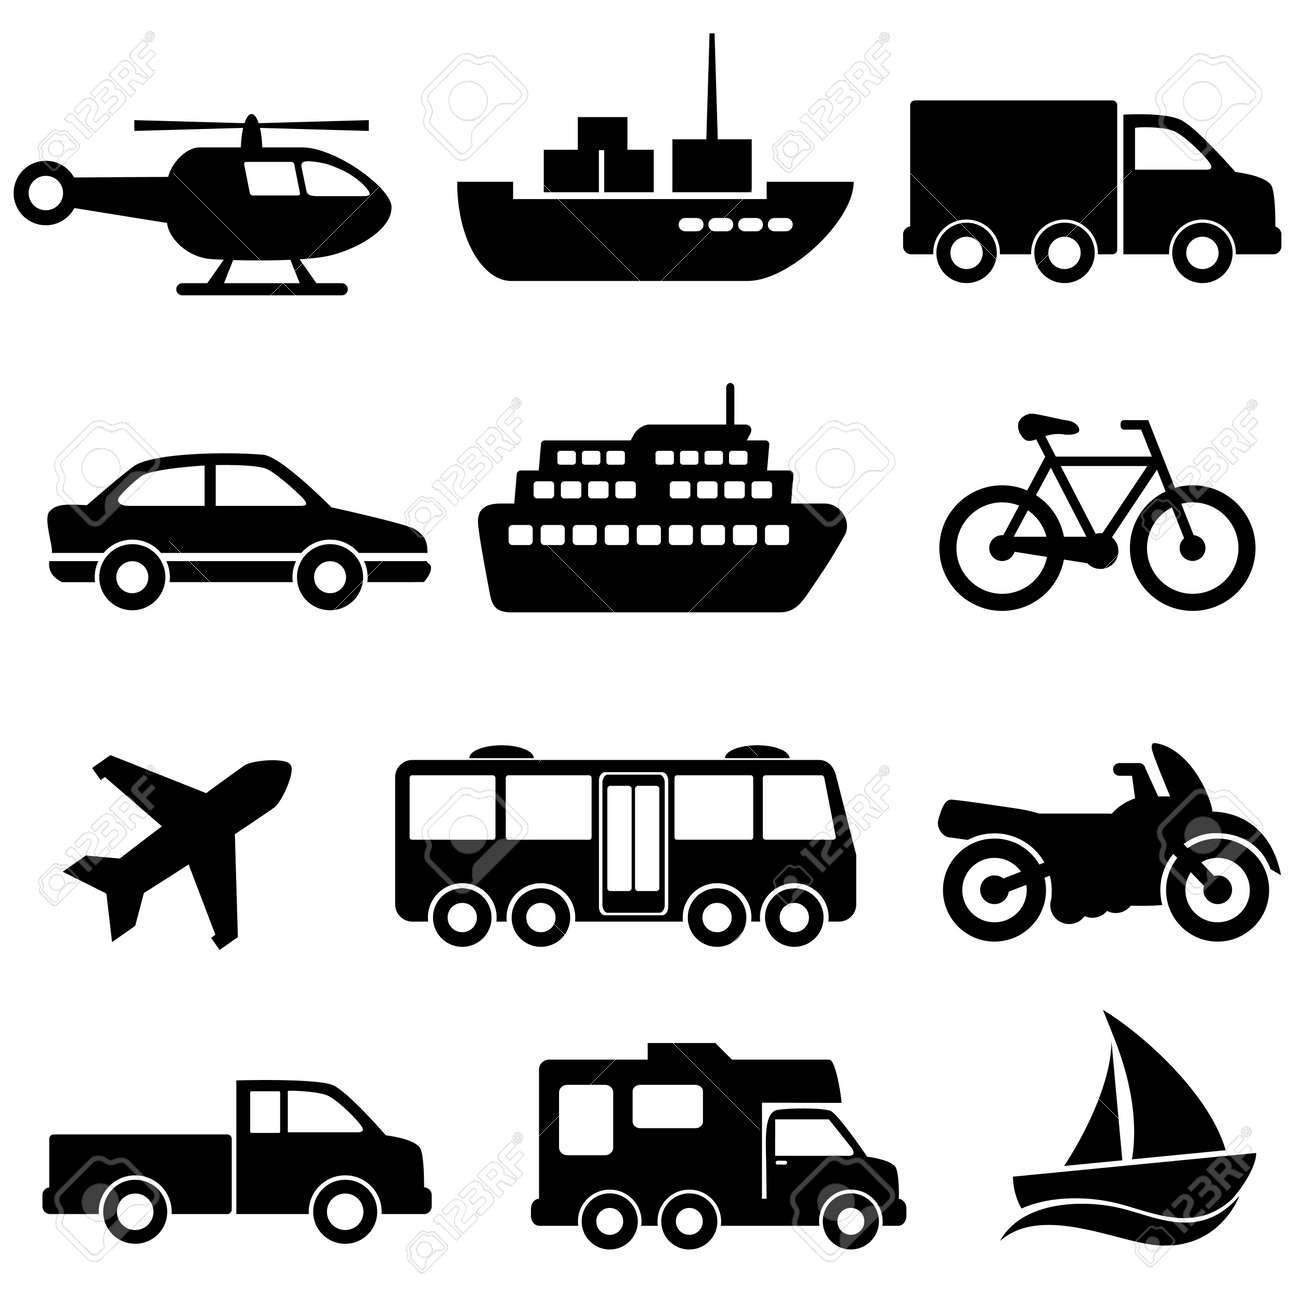 Transportation icon set on white background Stock Vector - 14993994